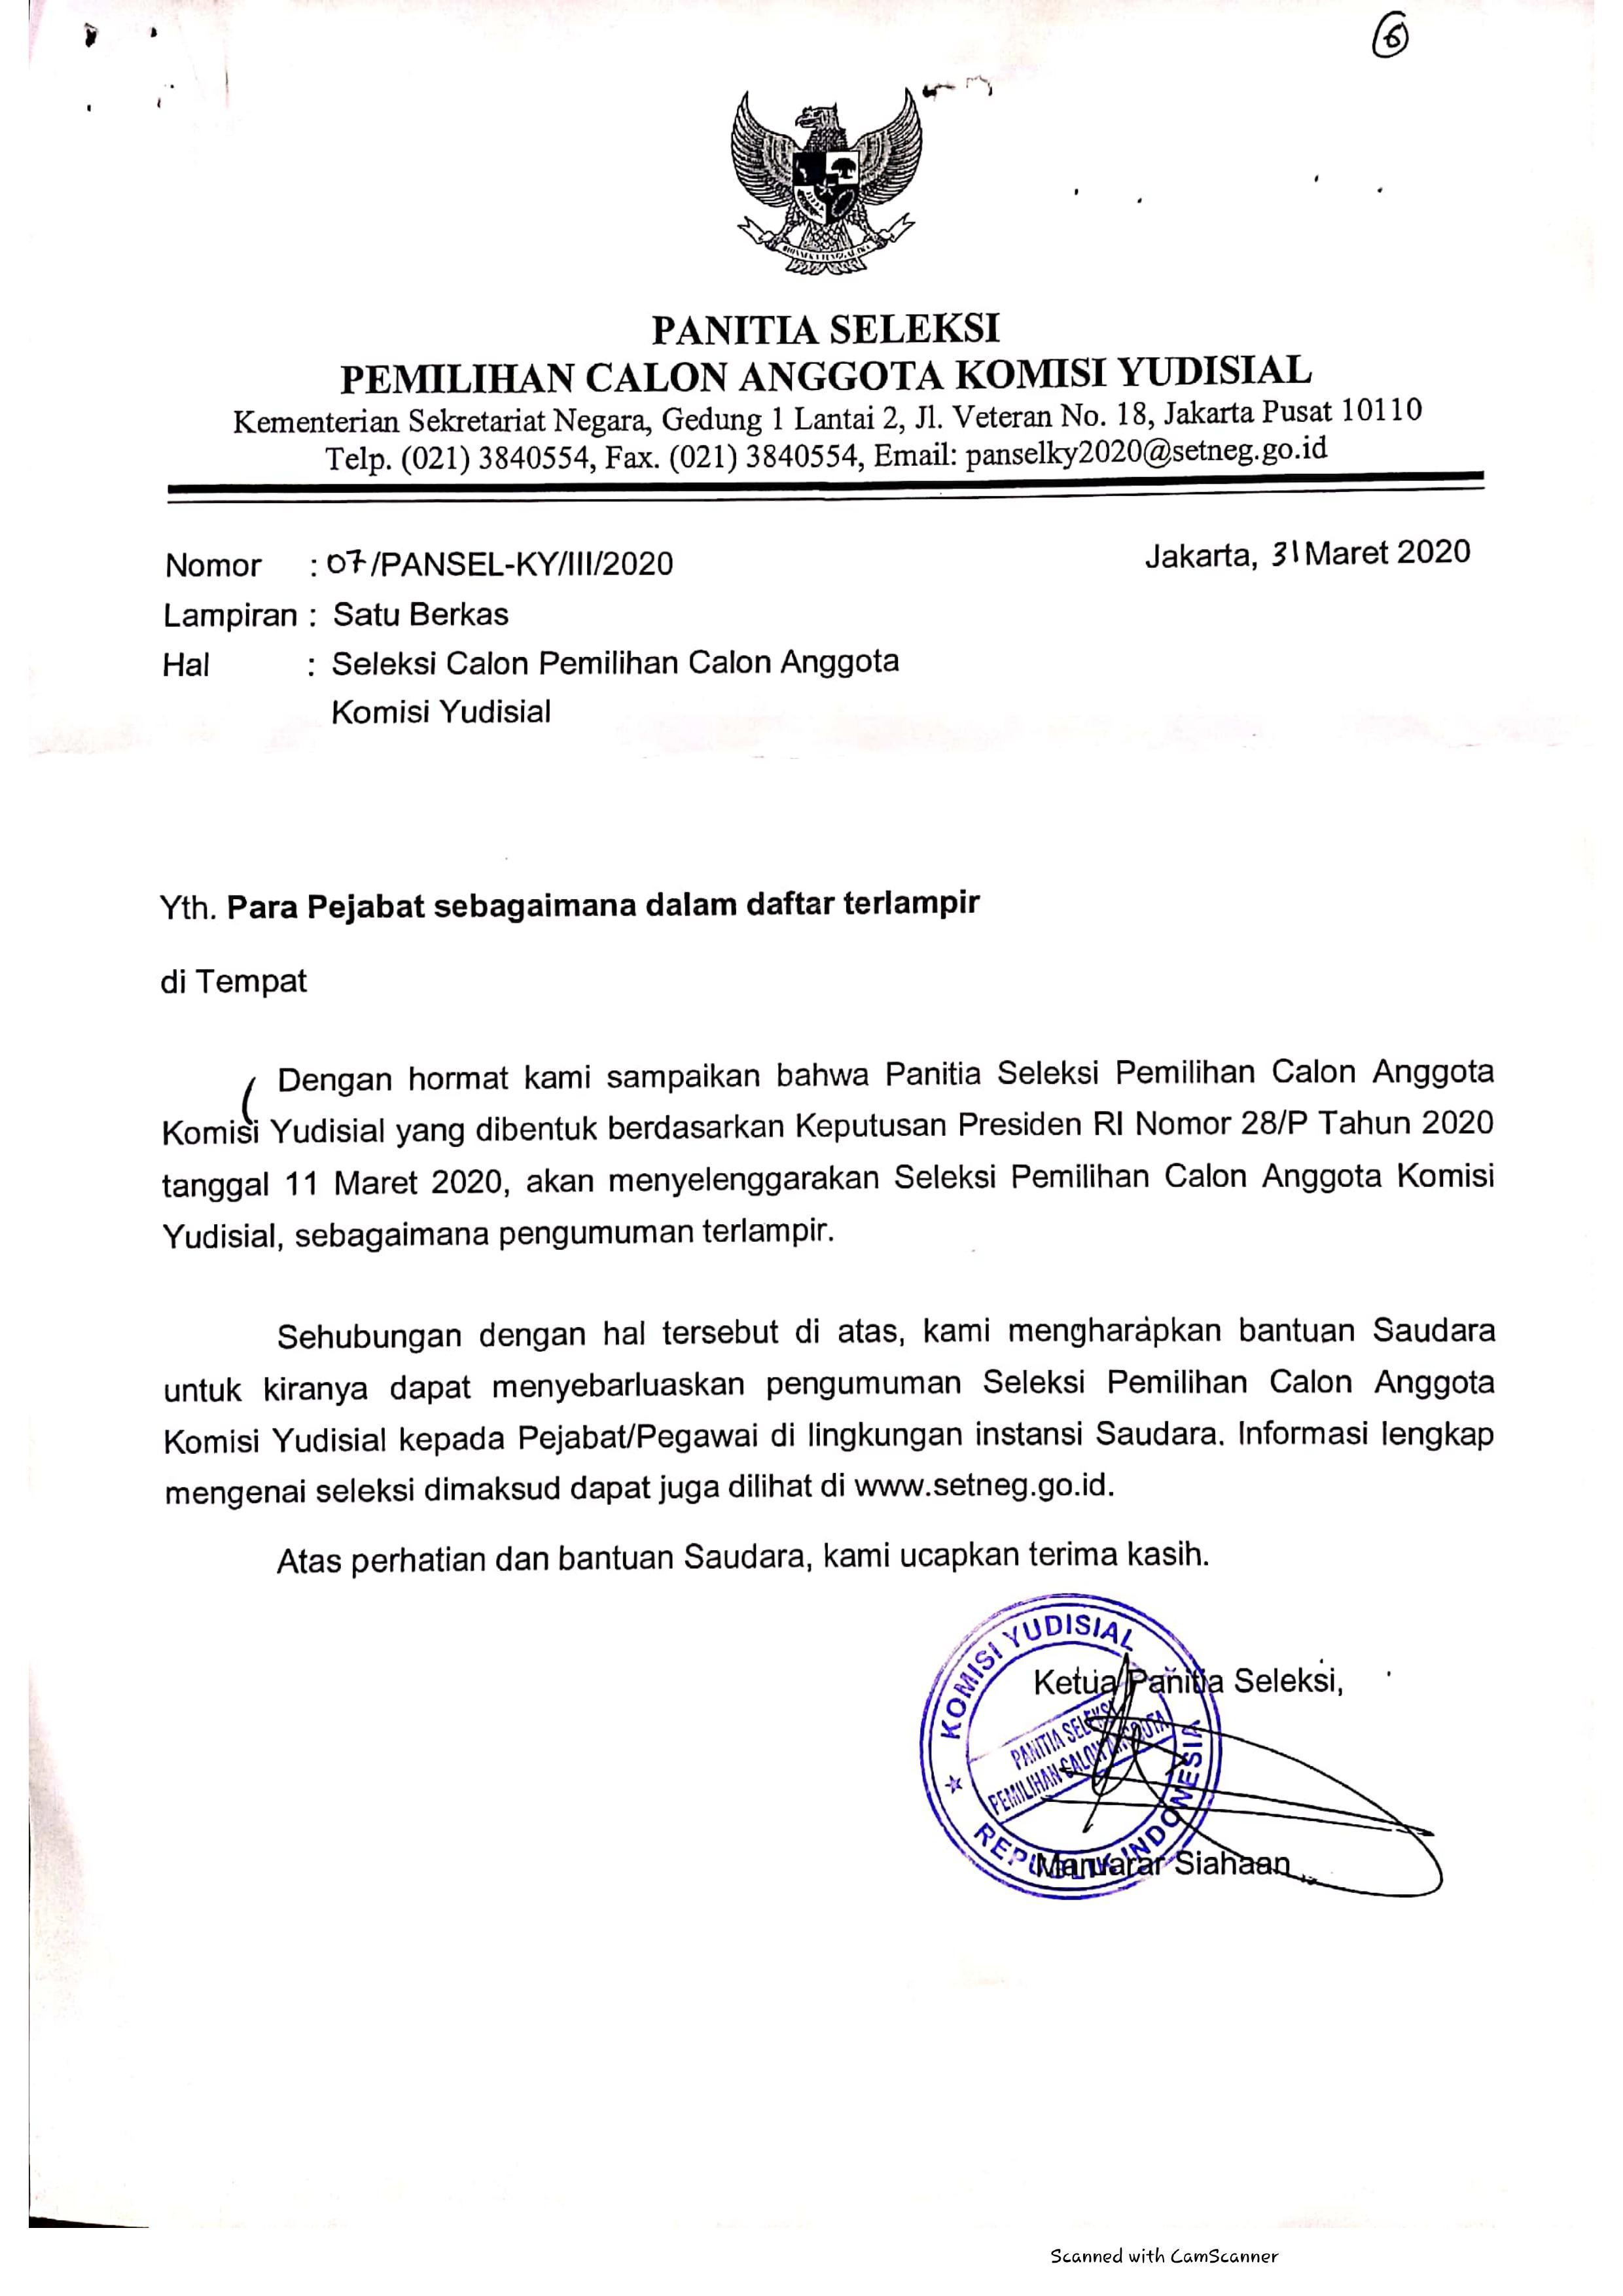 Seleksi Calon Pemilihan Calon Anggota Komisi Yudisial